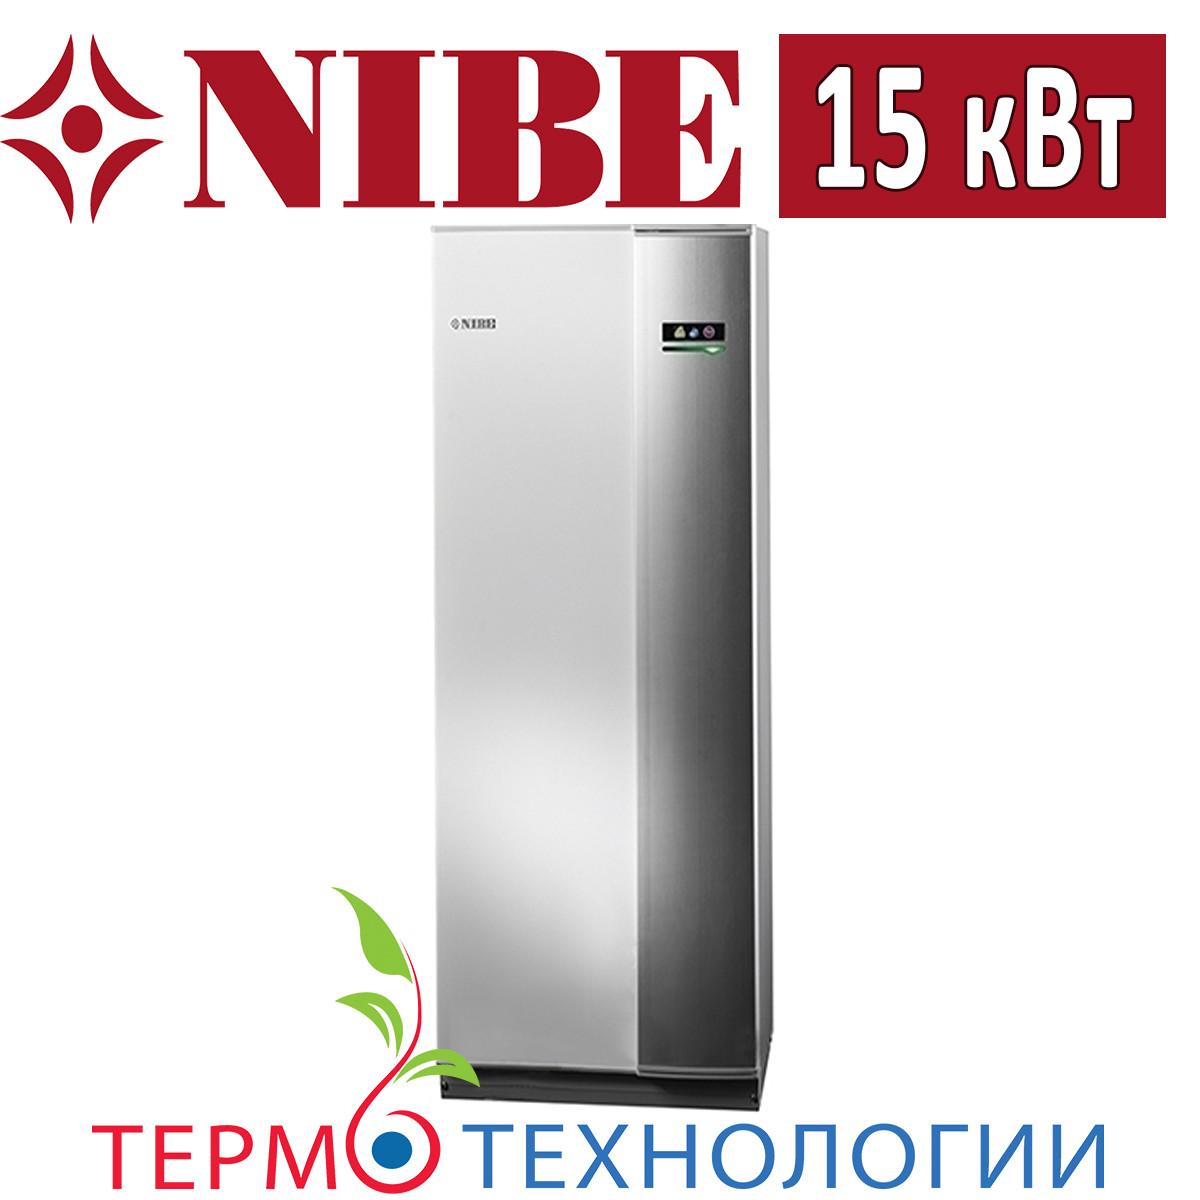 Тепловой насос грунт-вода Nibe F1145 15 кВт, 380 В